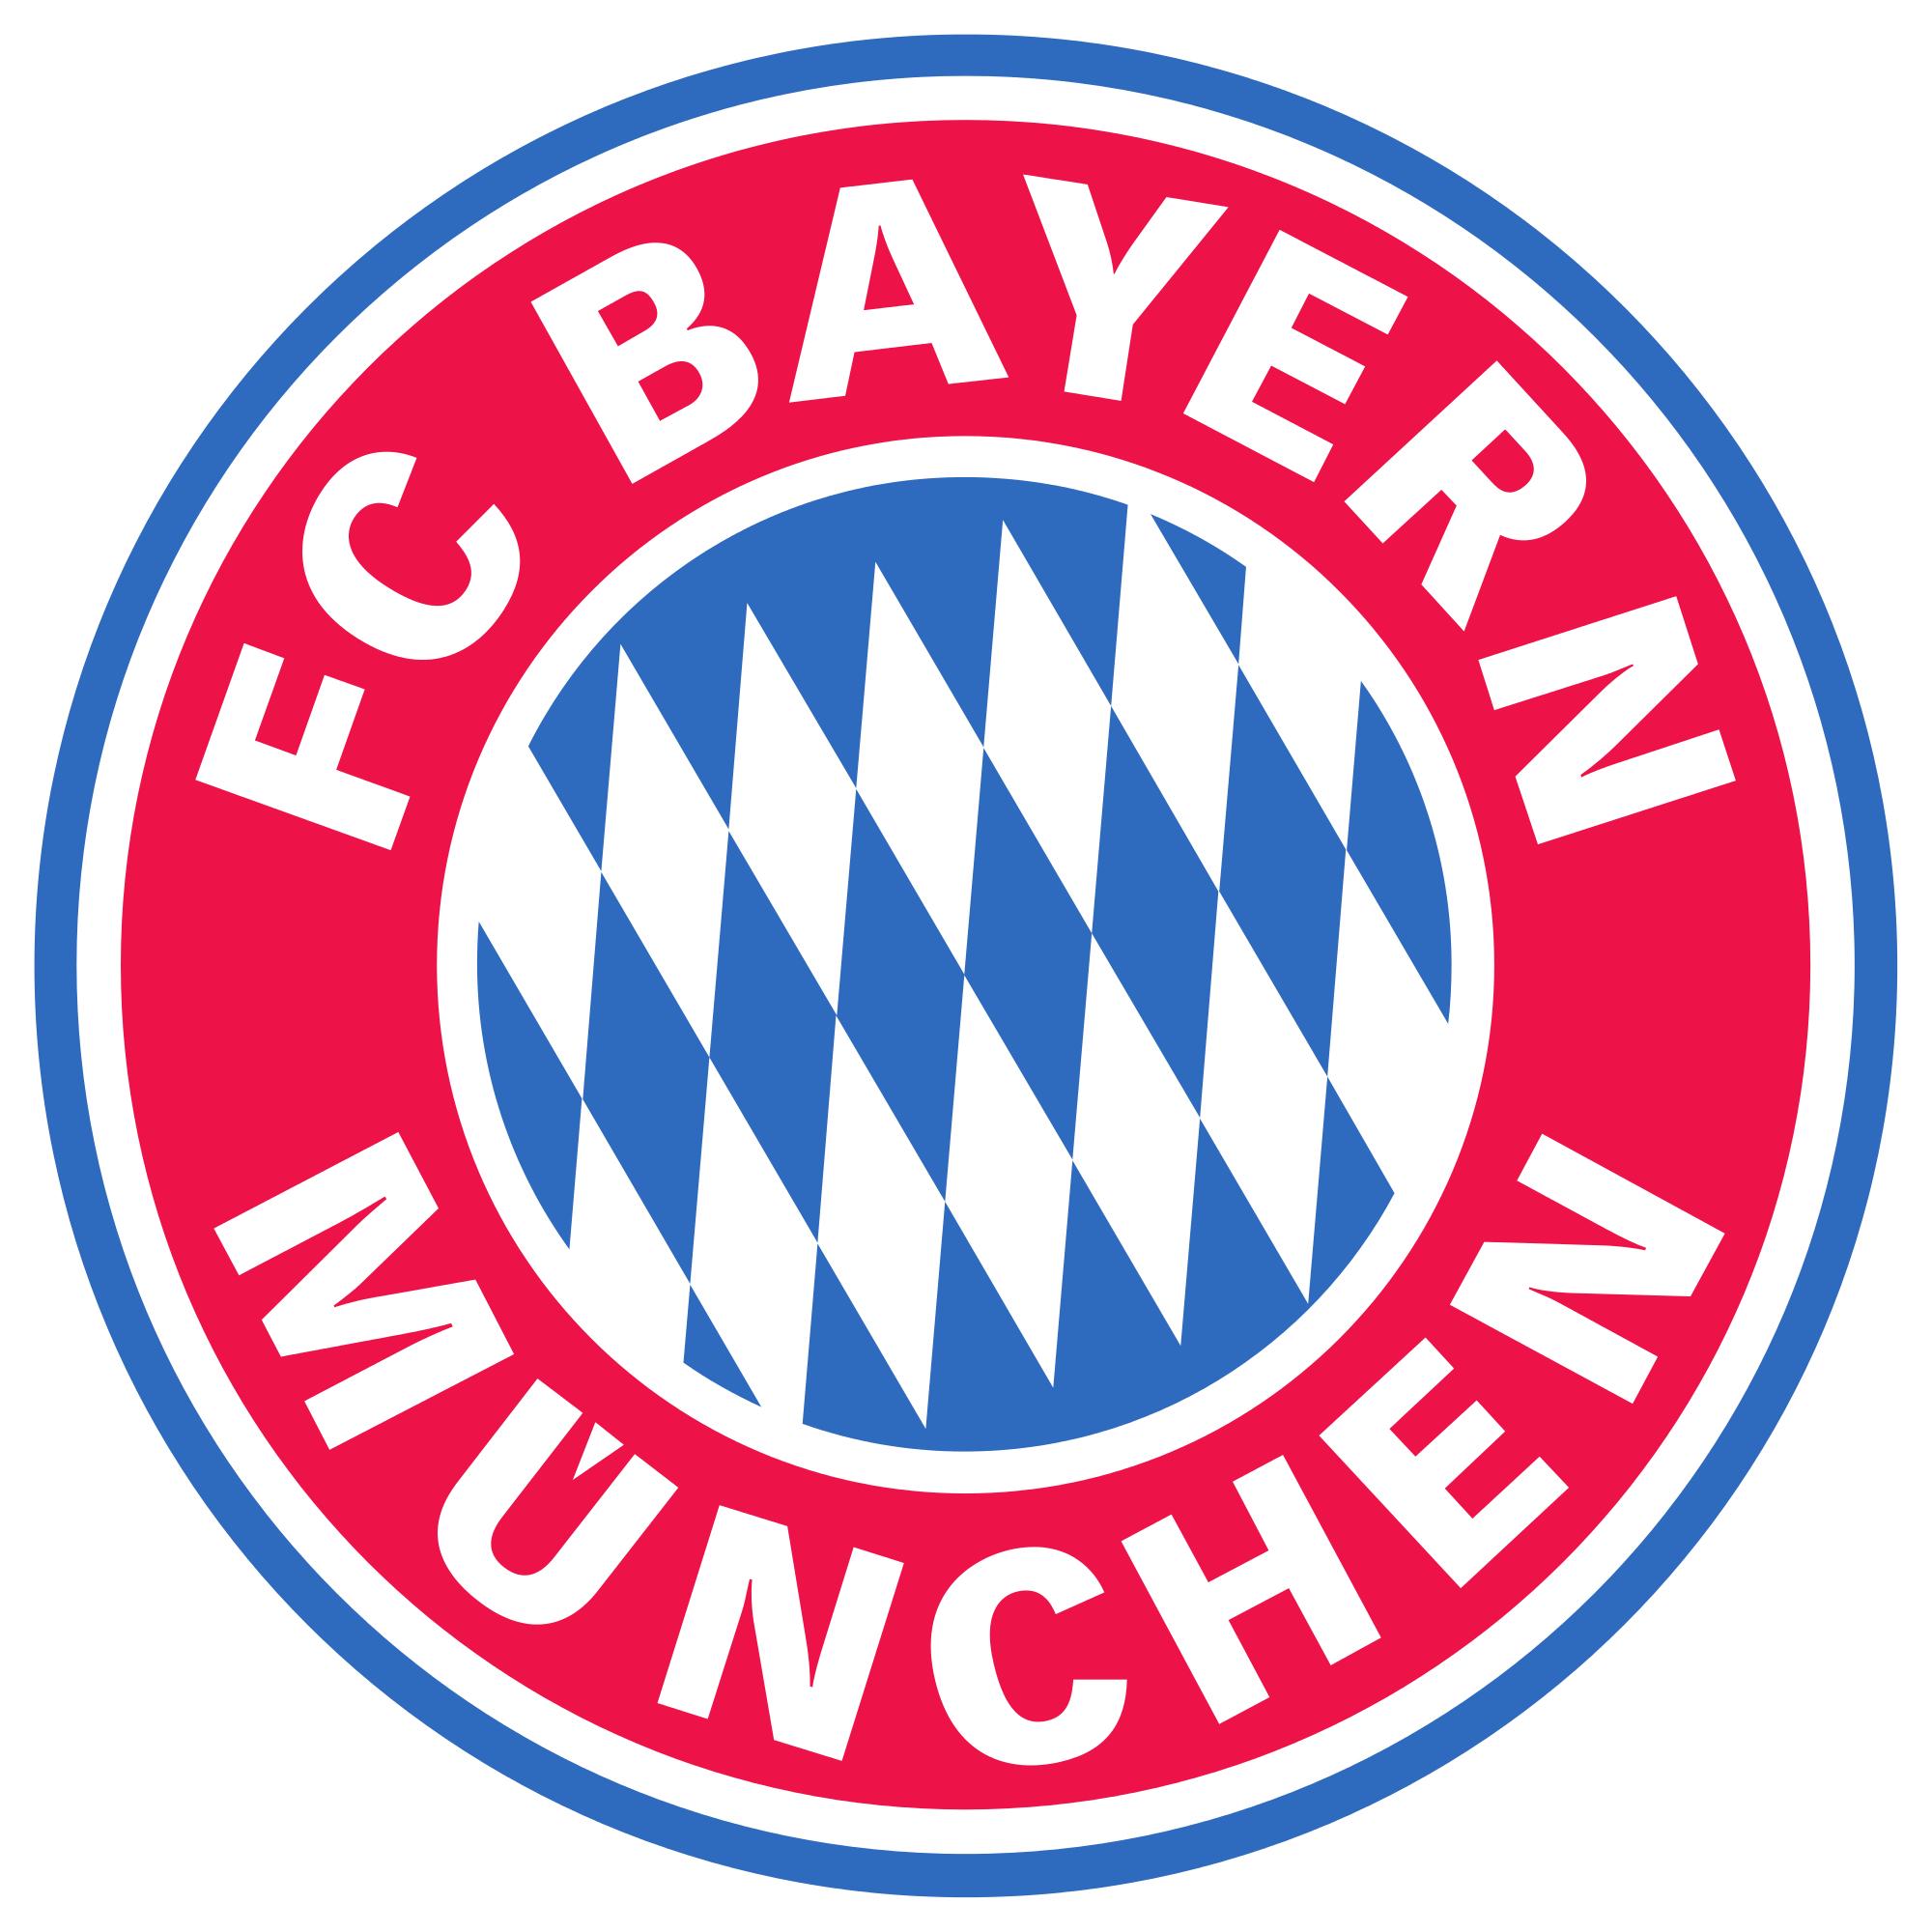 Sky zeigt Mainz gegen Bayern (HD) live im Free-TV! (1. Bundesliga)